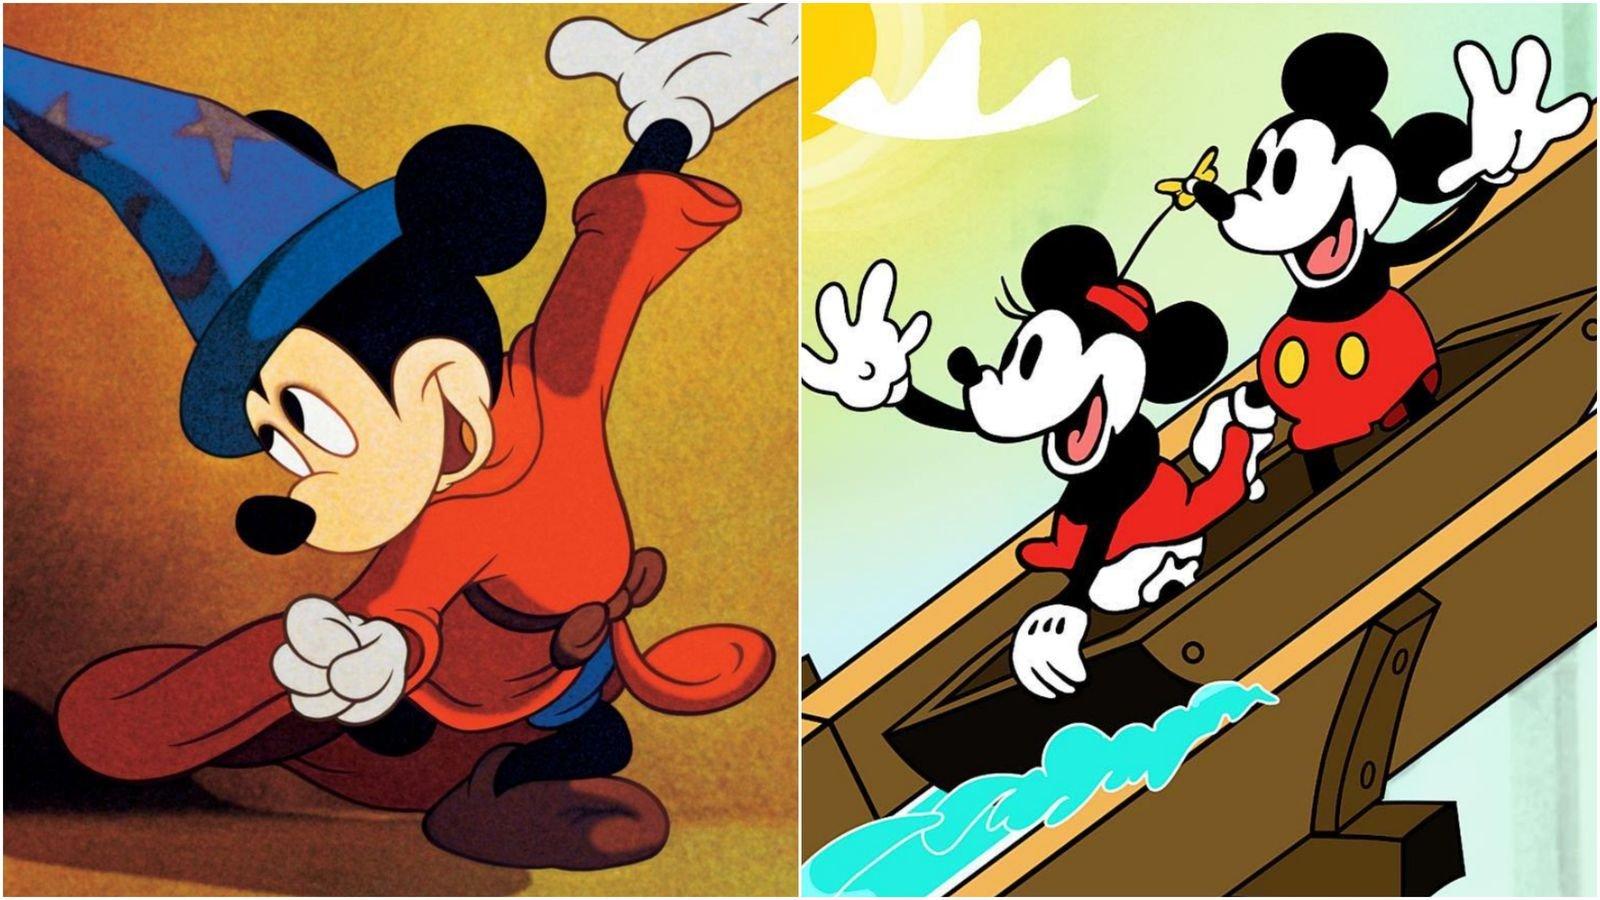 img 5bd8e2255a26c.png?resize=1200,630 - 【米奇90週年】關於迪士尼米老鼠的10個秘密:他原本是隻兔子,跟米妮竟然是「這個」關係!